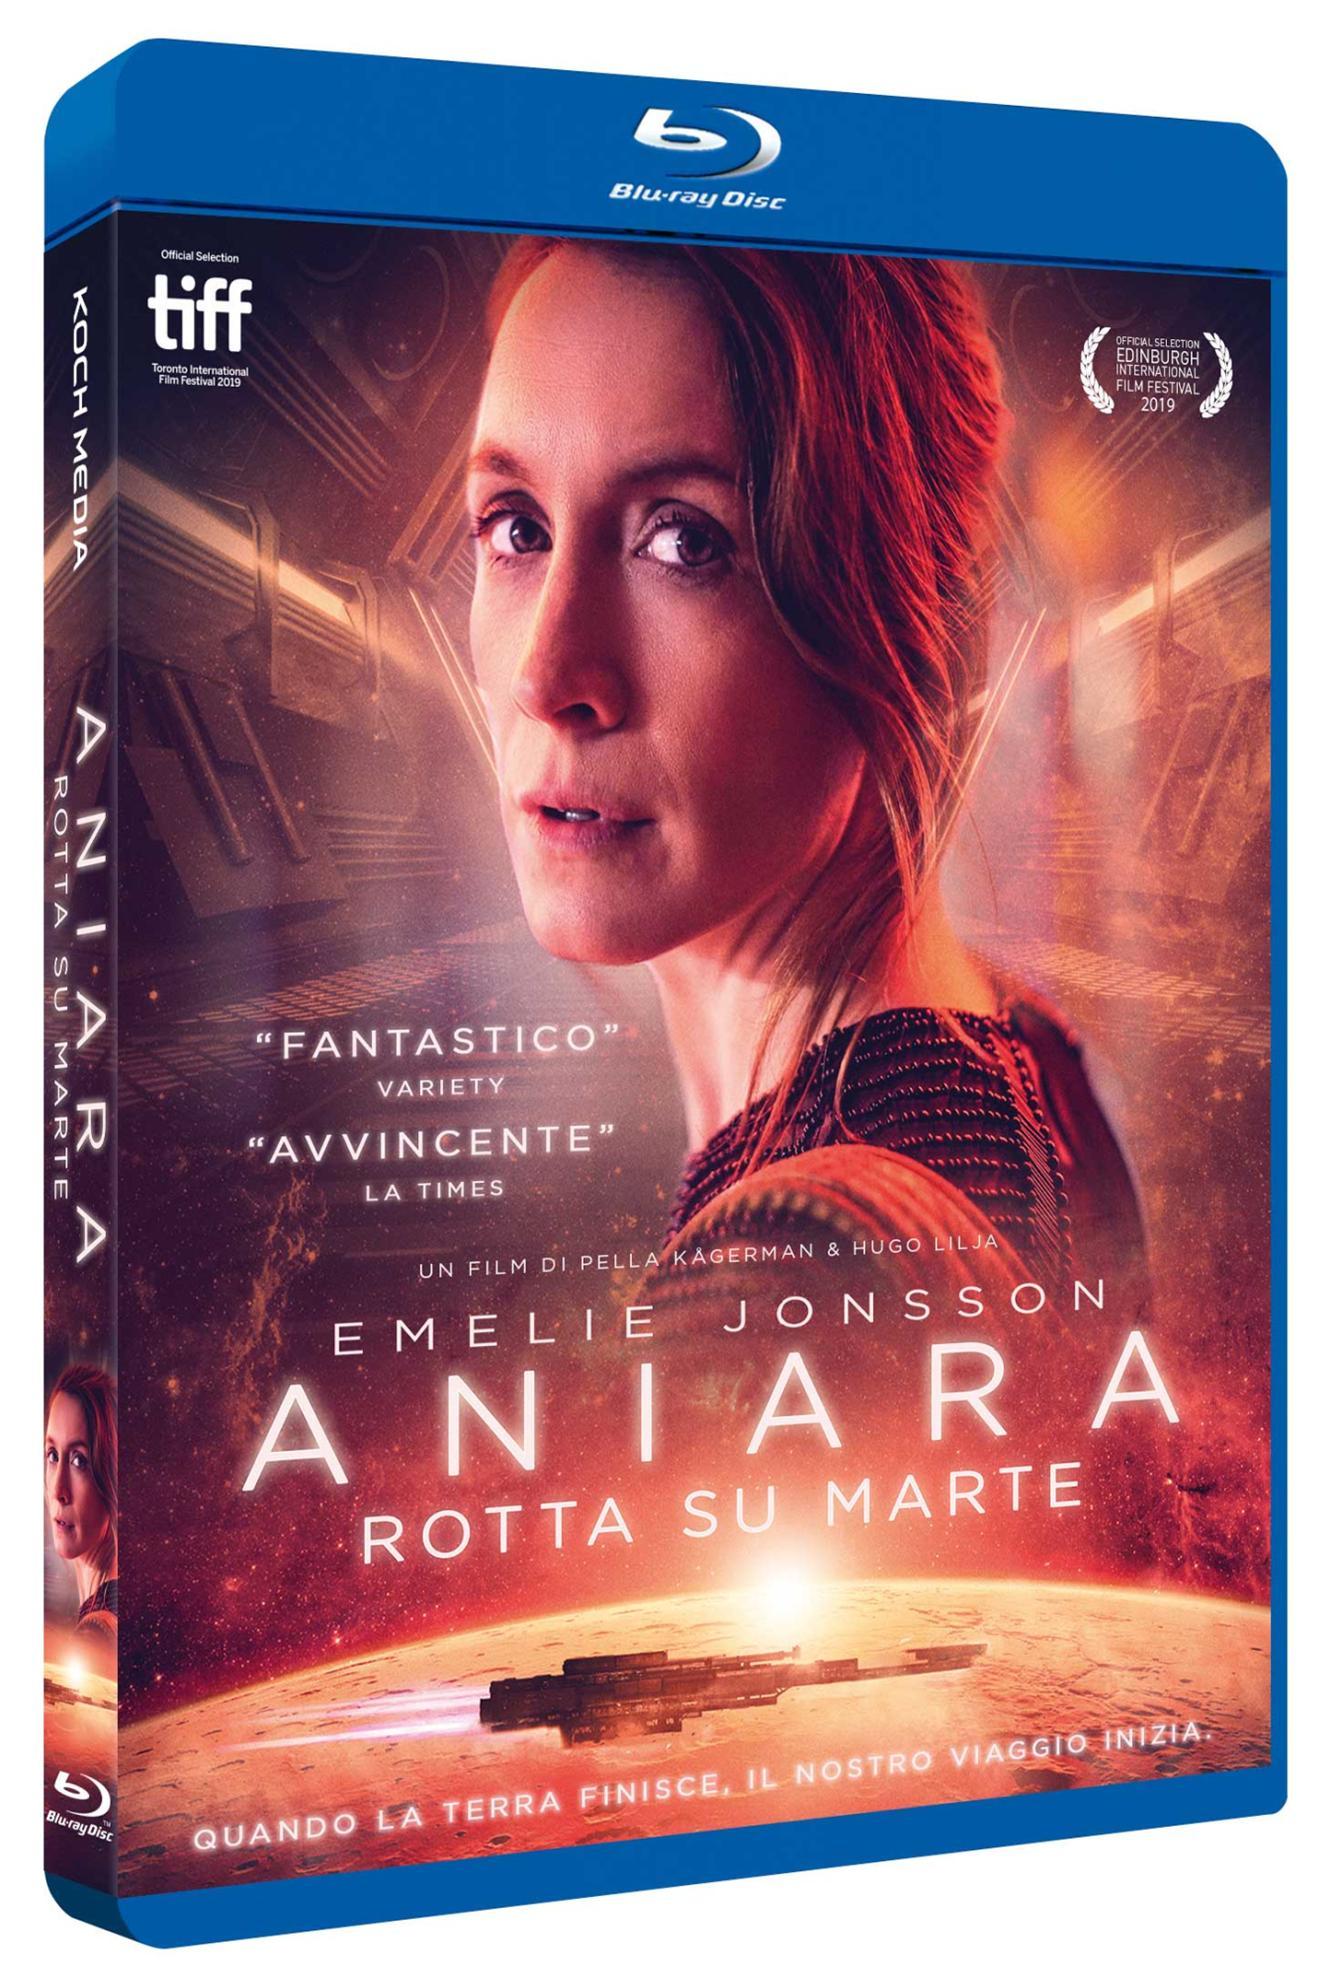 ANIARA - ROTTA SU MARTE - BLU RAY